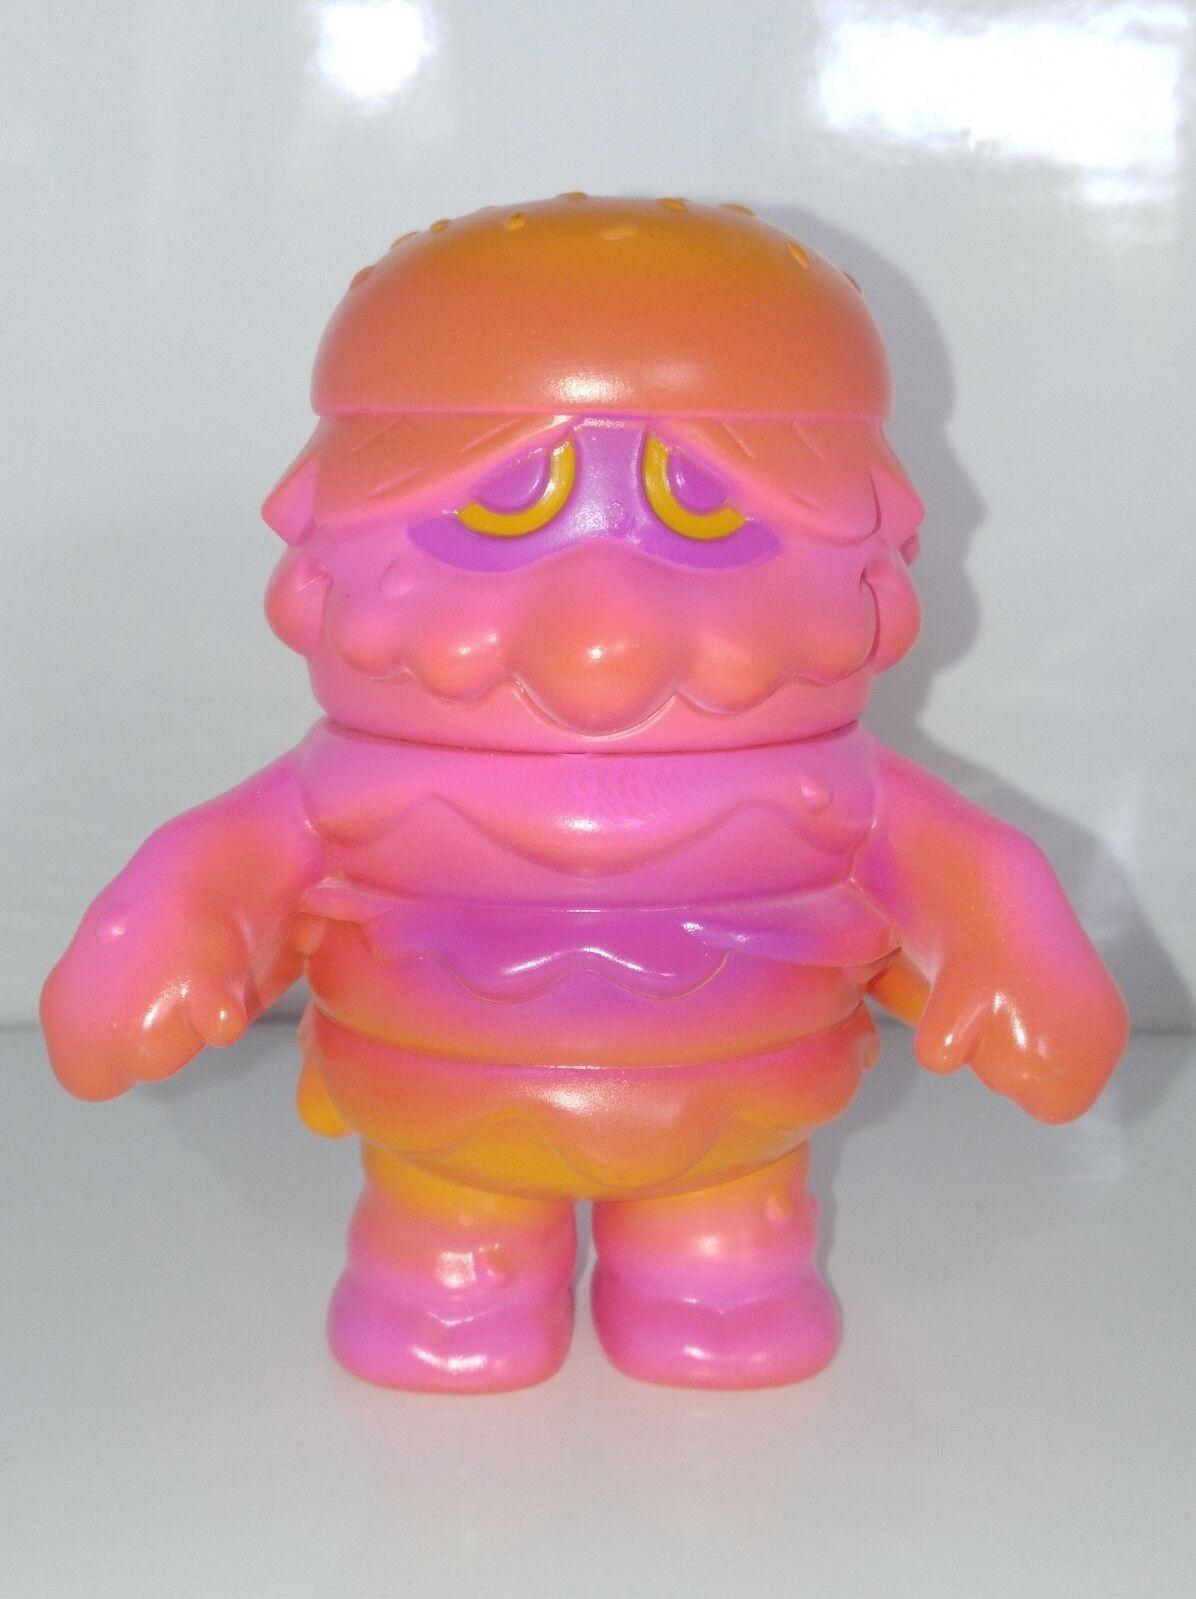 Arbito x Super7 Patty Power sofubi kaiju Japan vinyl designer toy